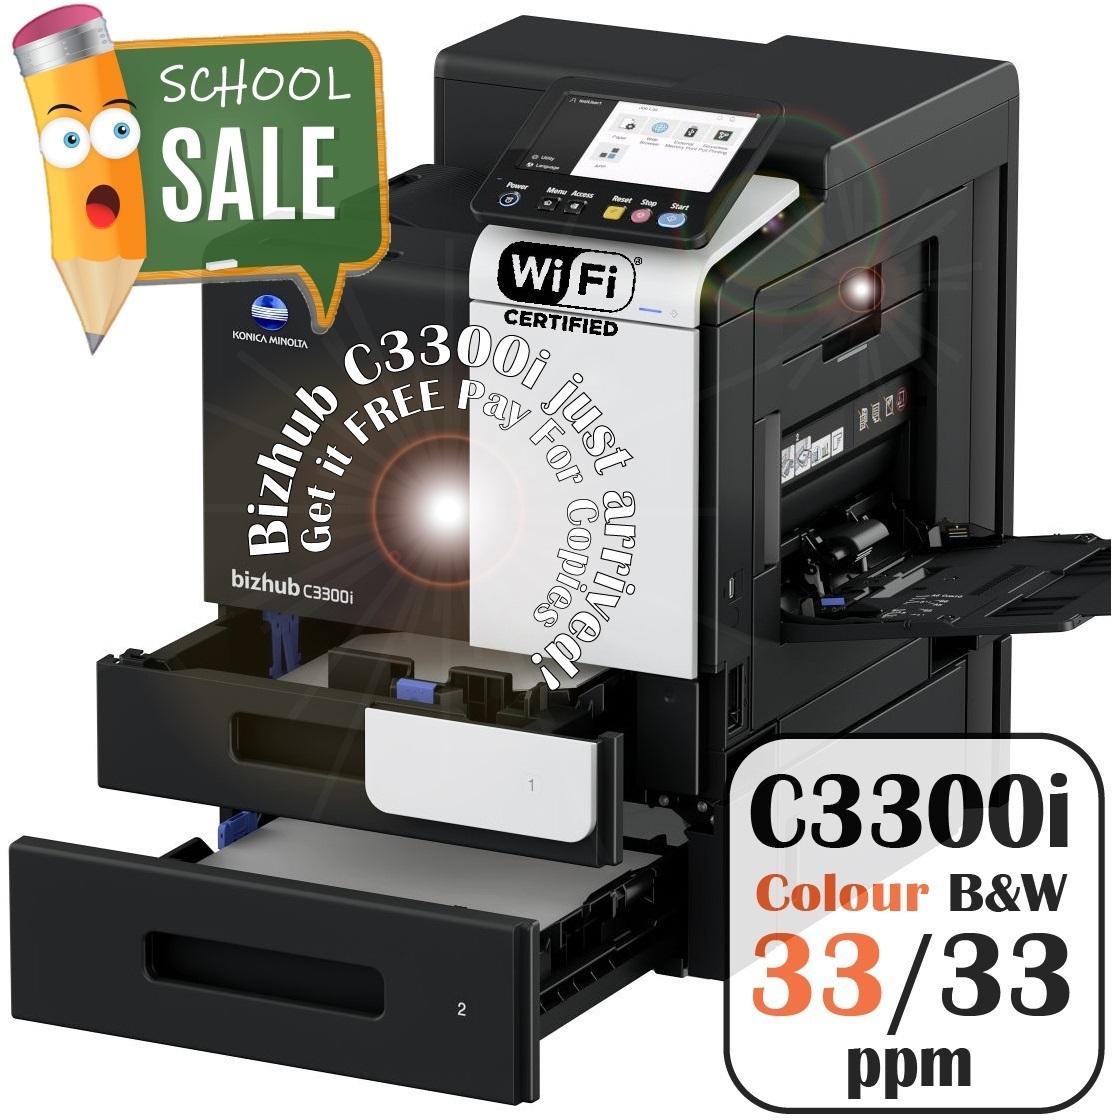 Konica Minolta Bizhub C3300i PF P20 Colour Printer Rental Price Offers Open Trays